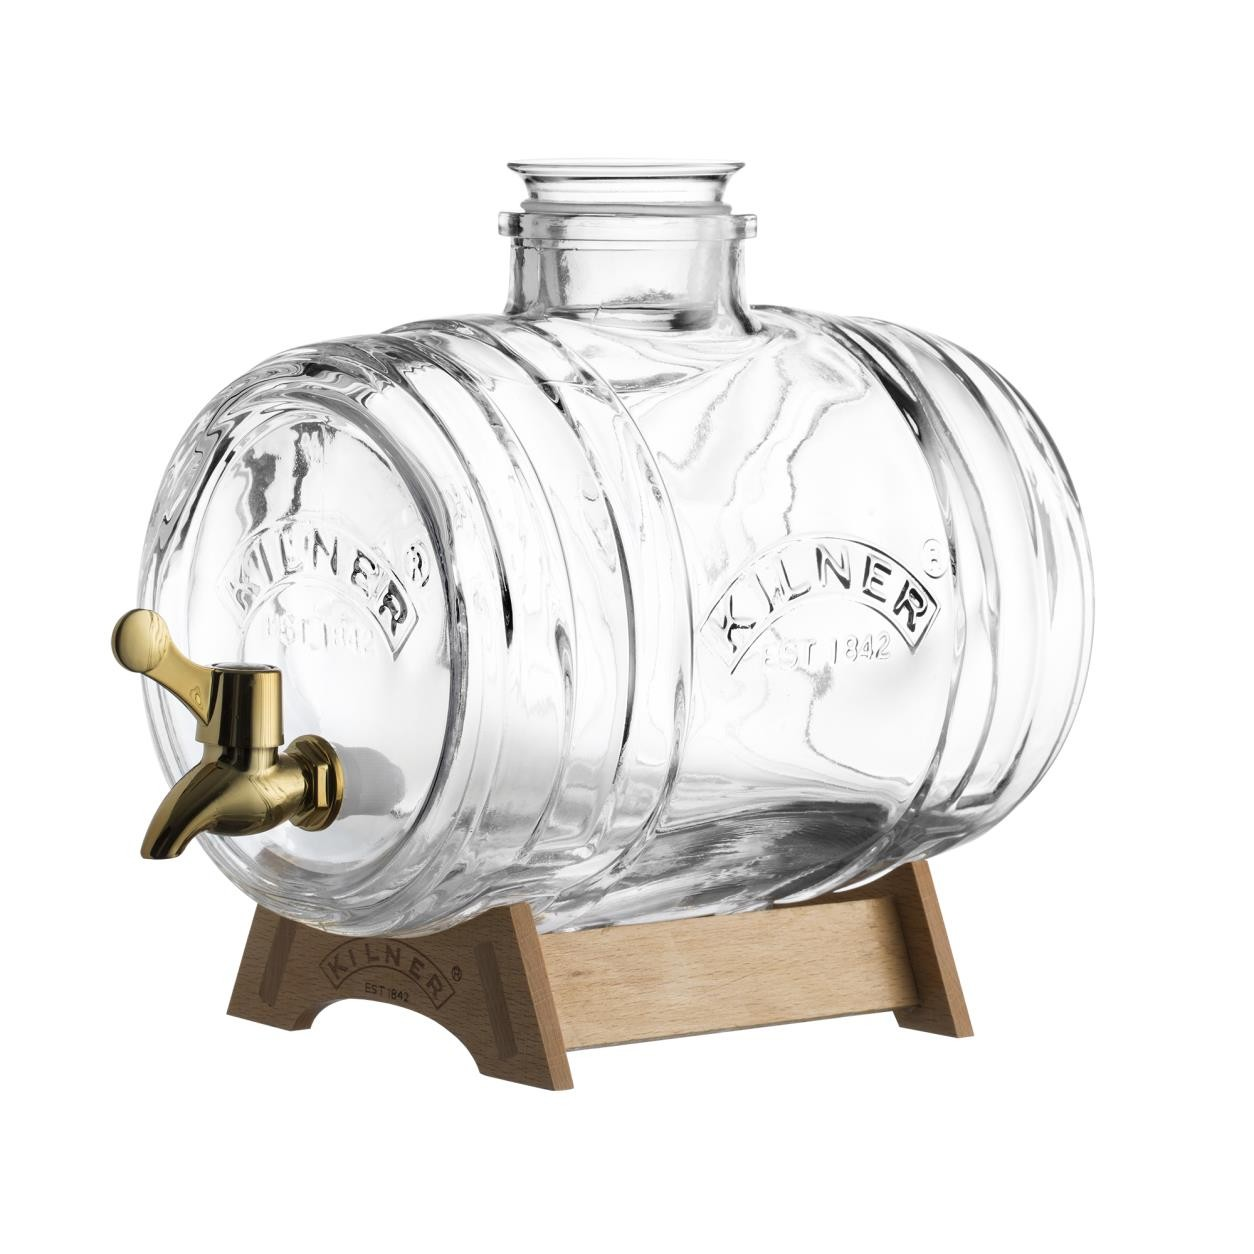 BARREL DRINKS DISPENSER 118 FL OZ